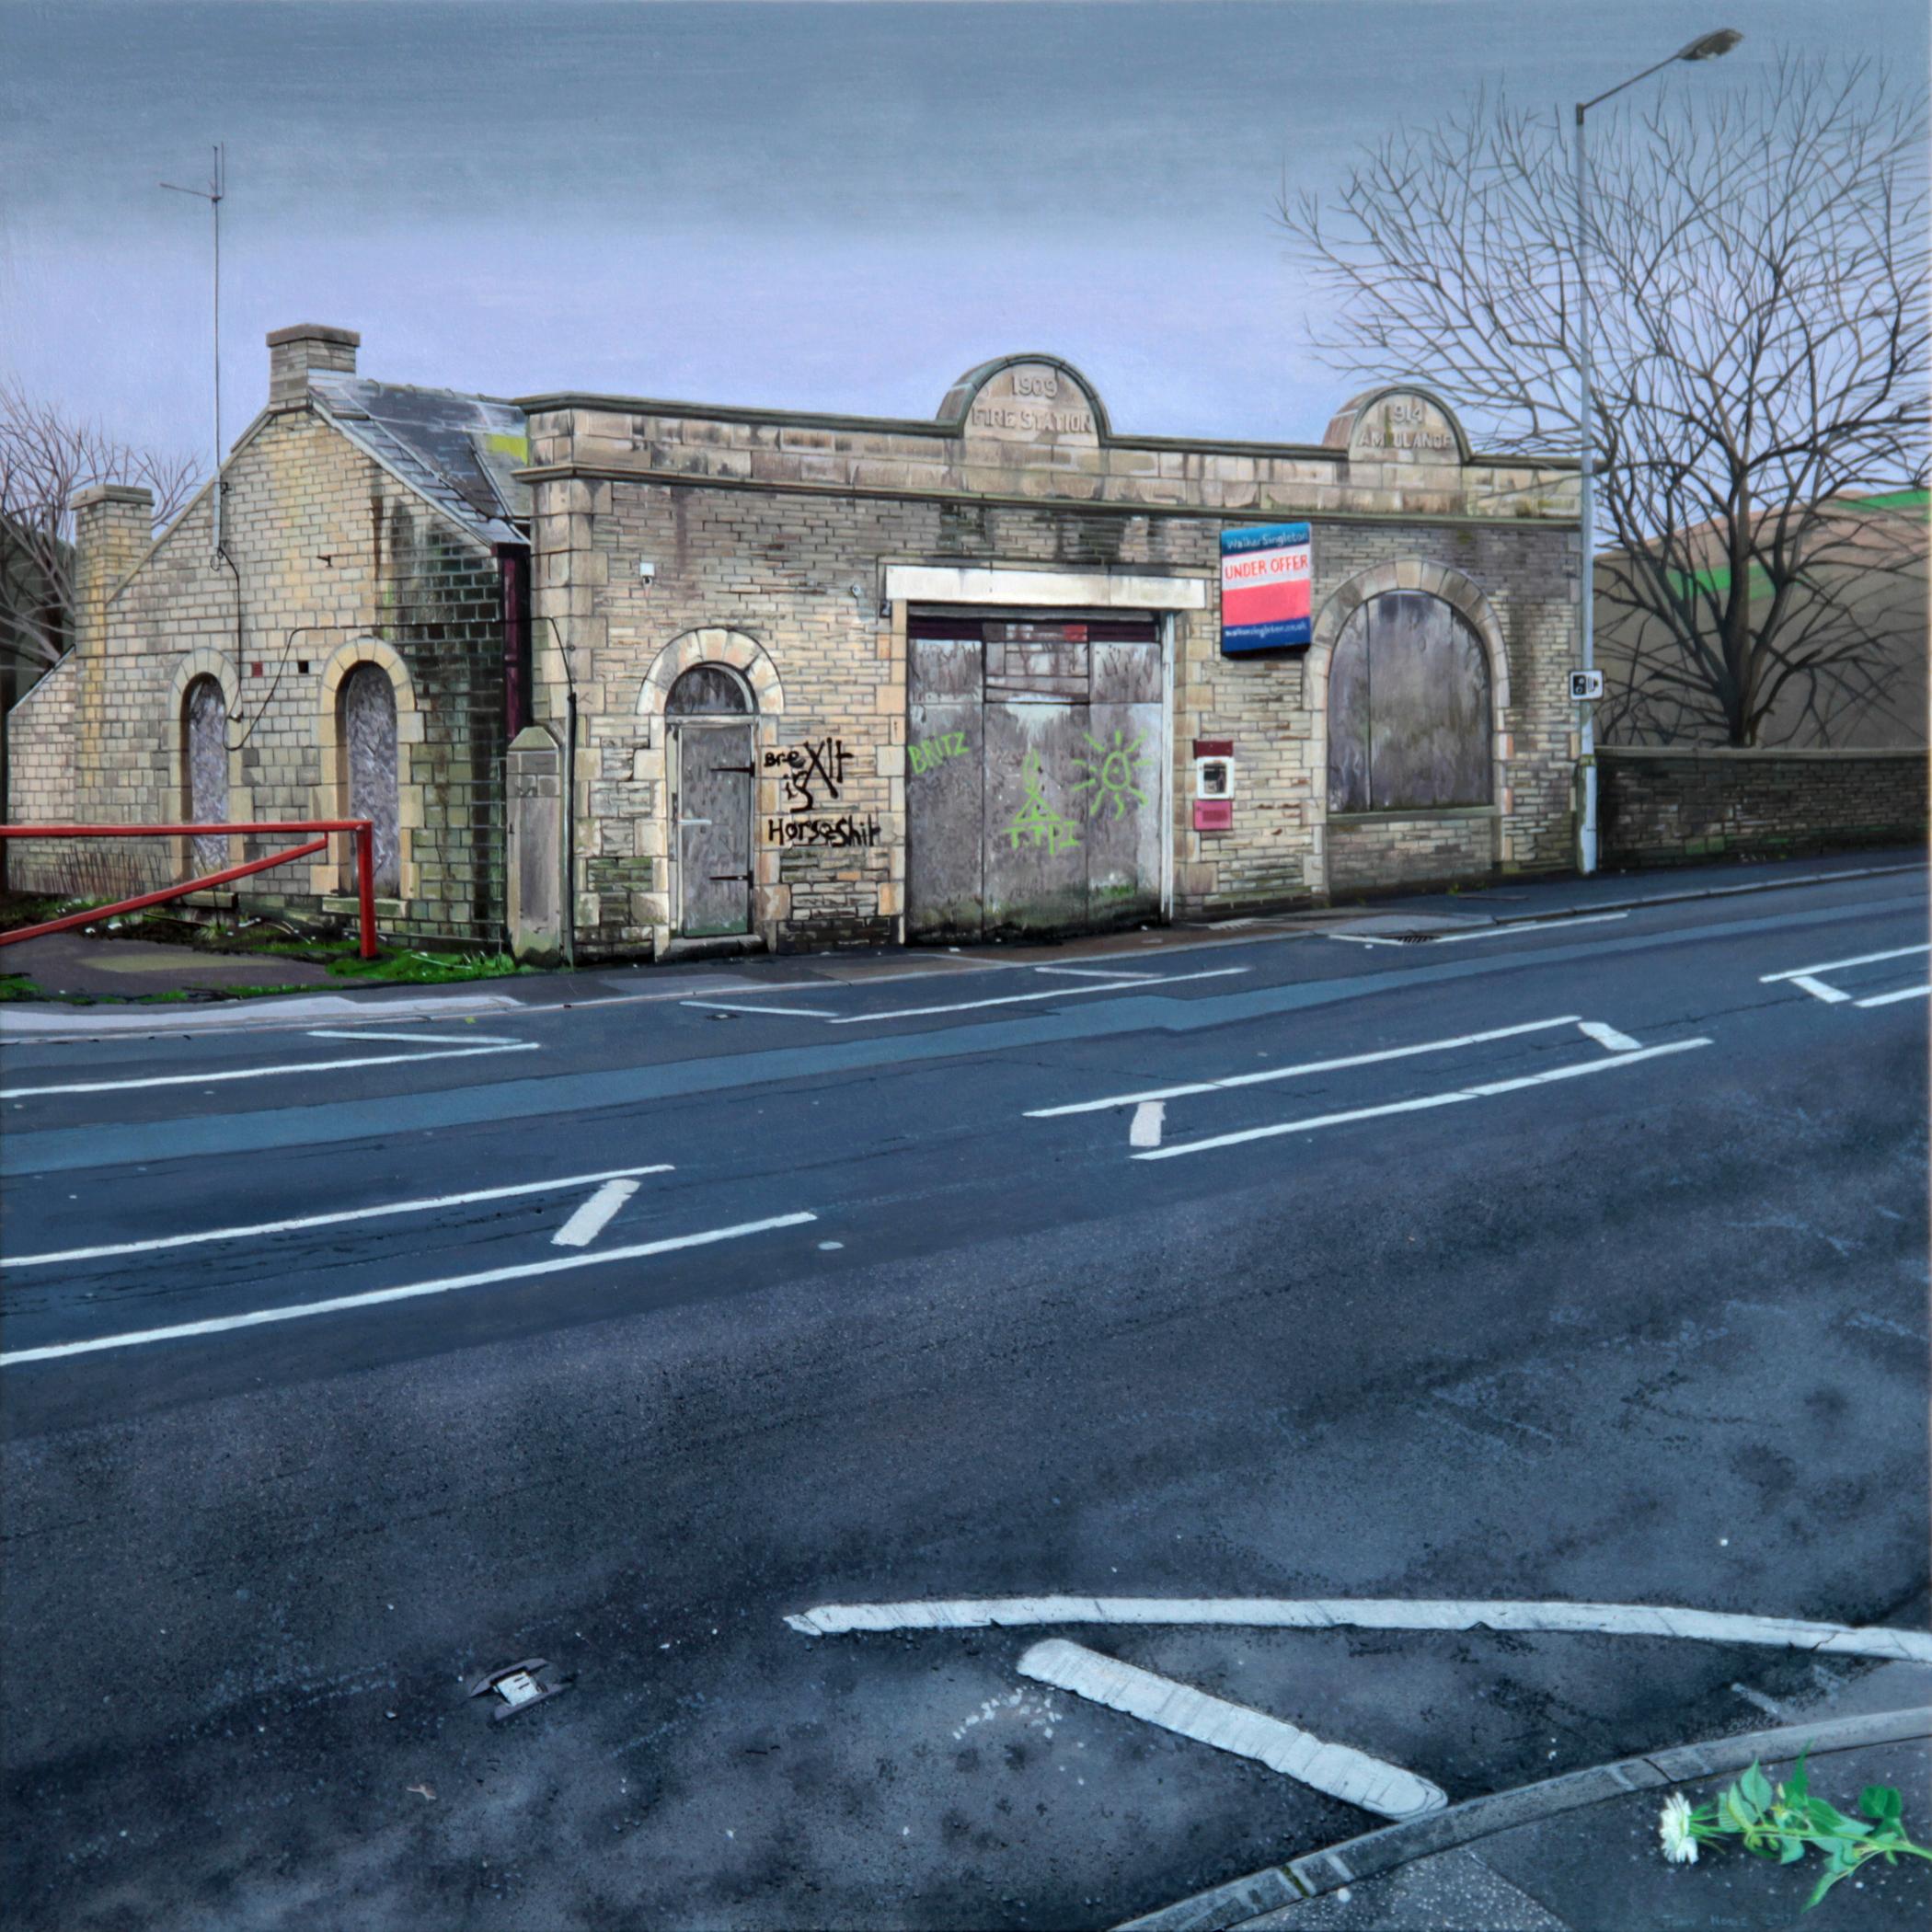 Tony Noble, The political landscape, 2017., Oil on panel., 60 x 60 x 2,  http://www.tonynoble-artist.com